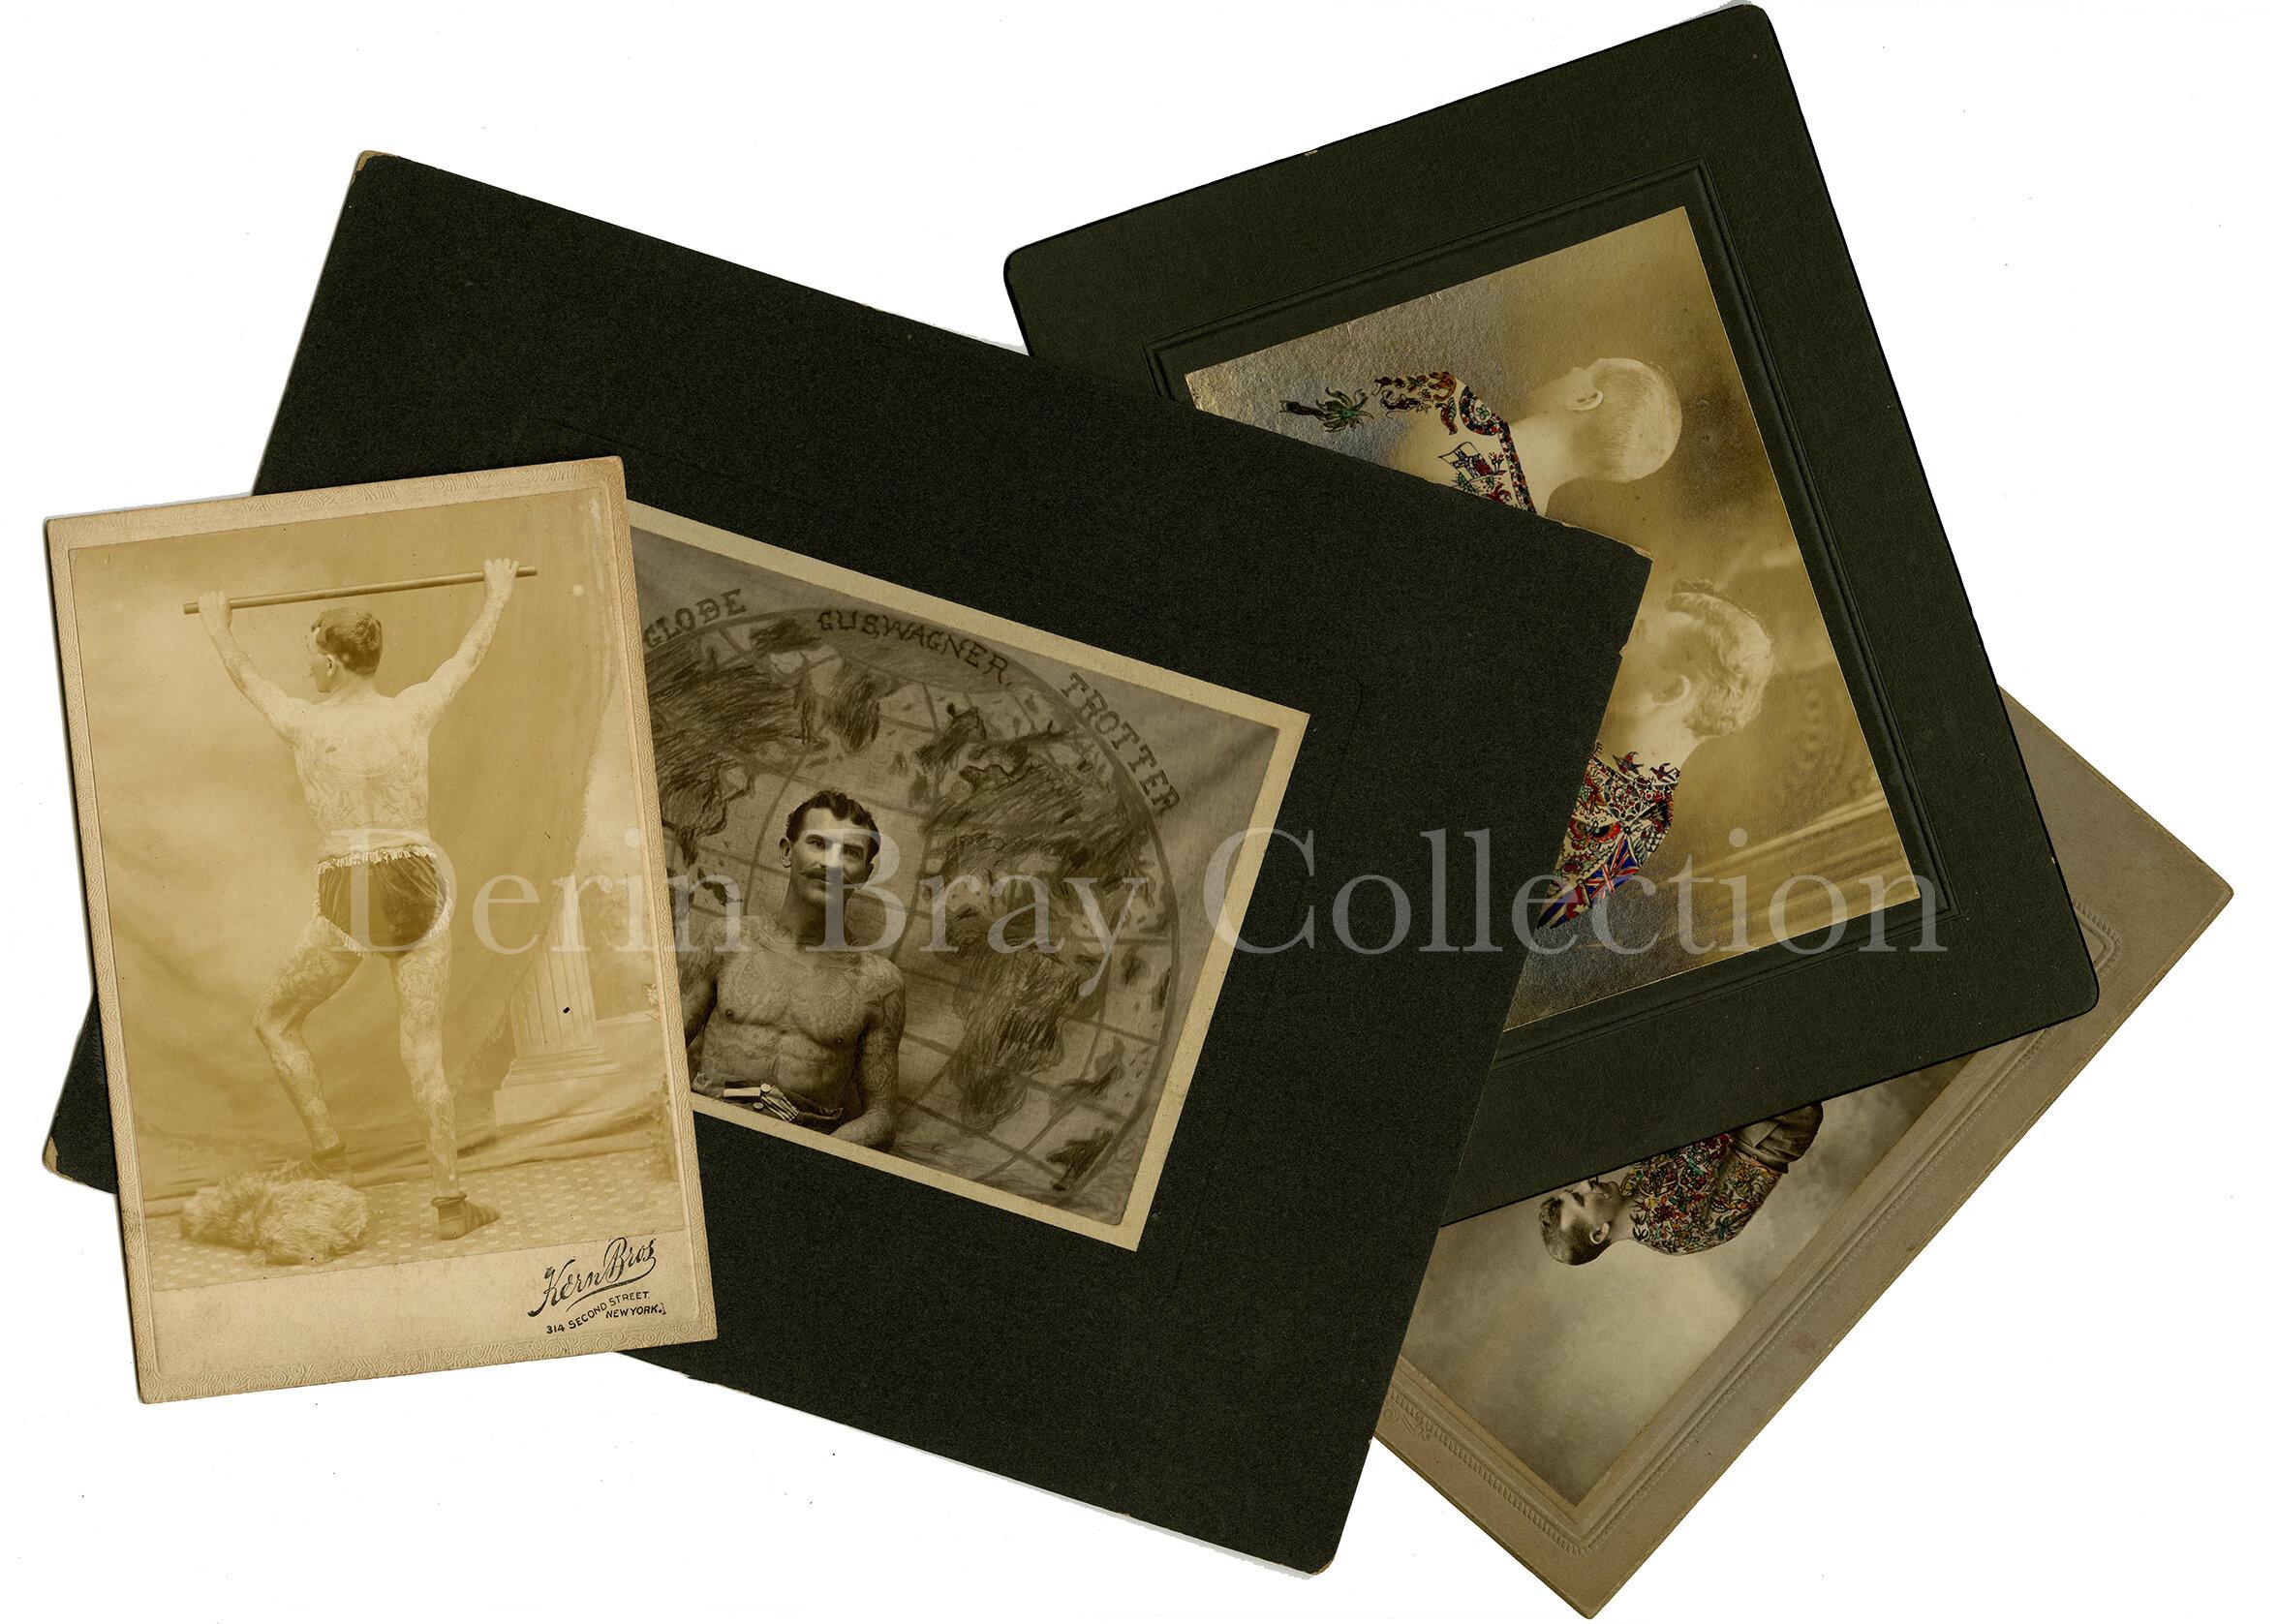 copyright 1907 1909 Mrs. Maud M Stevens Wagner tattooed woman original gus wagner antique photographs